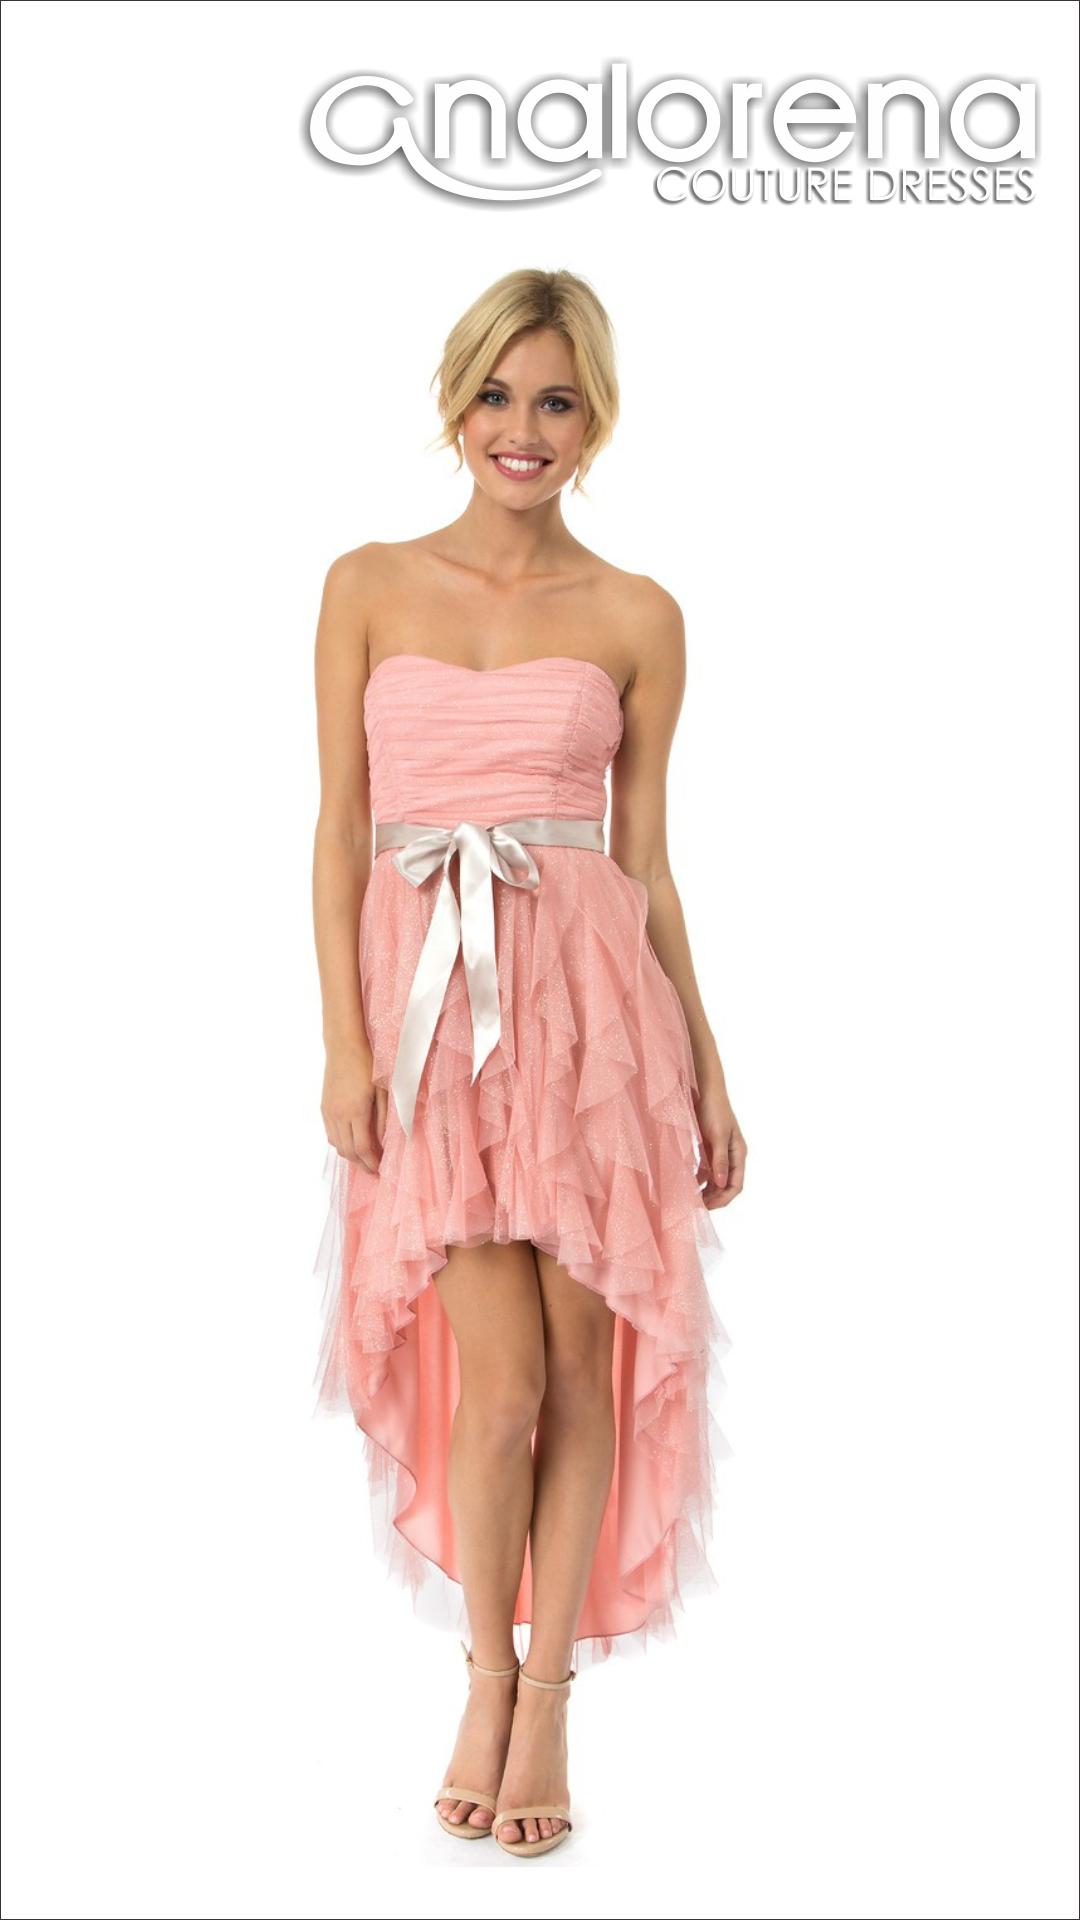 Vestidos cortos Analorena